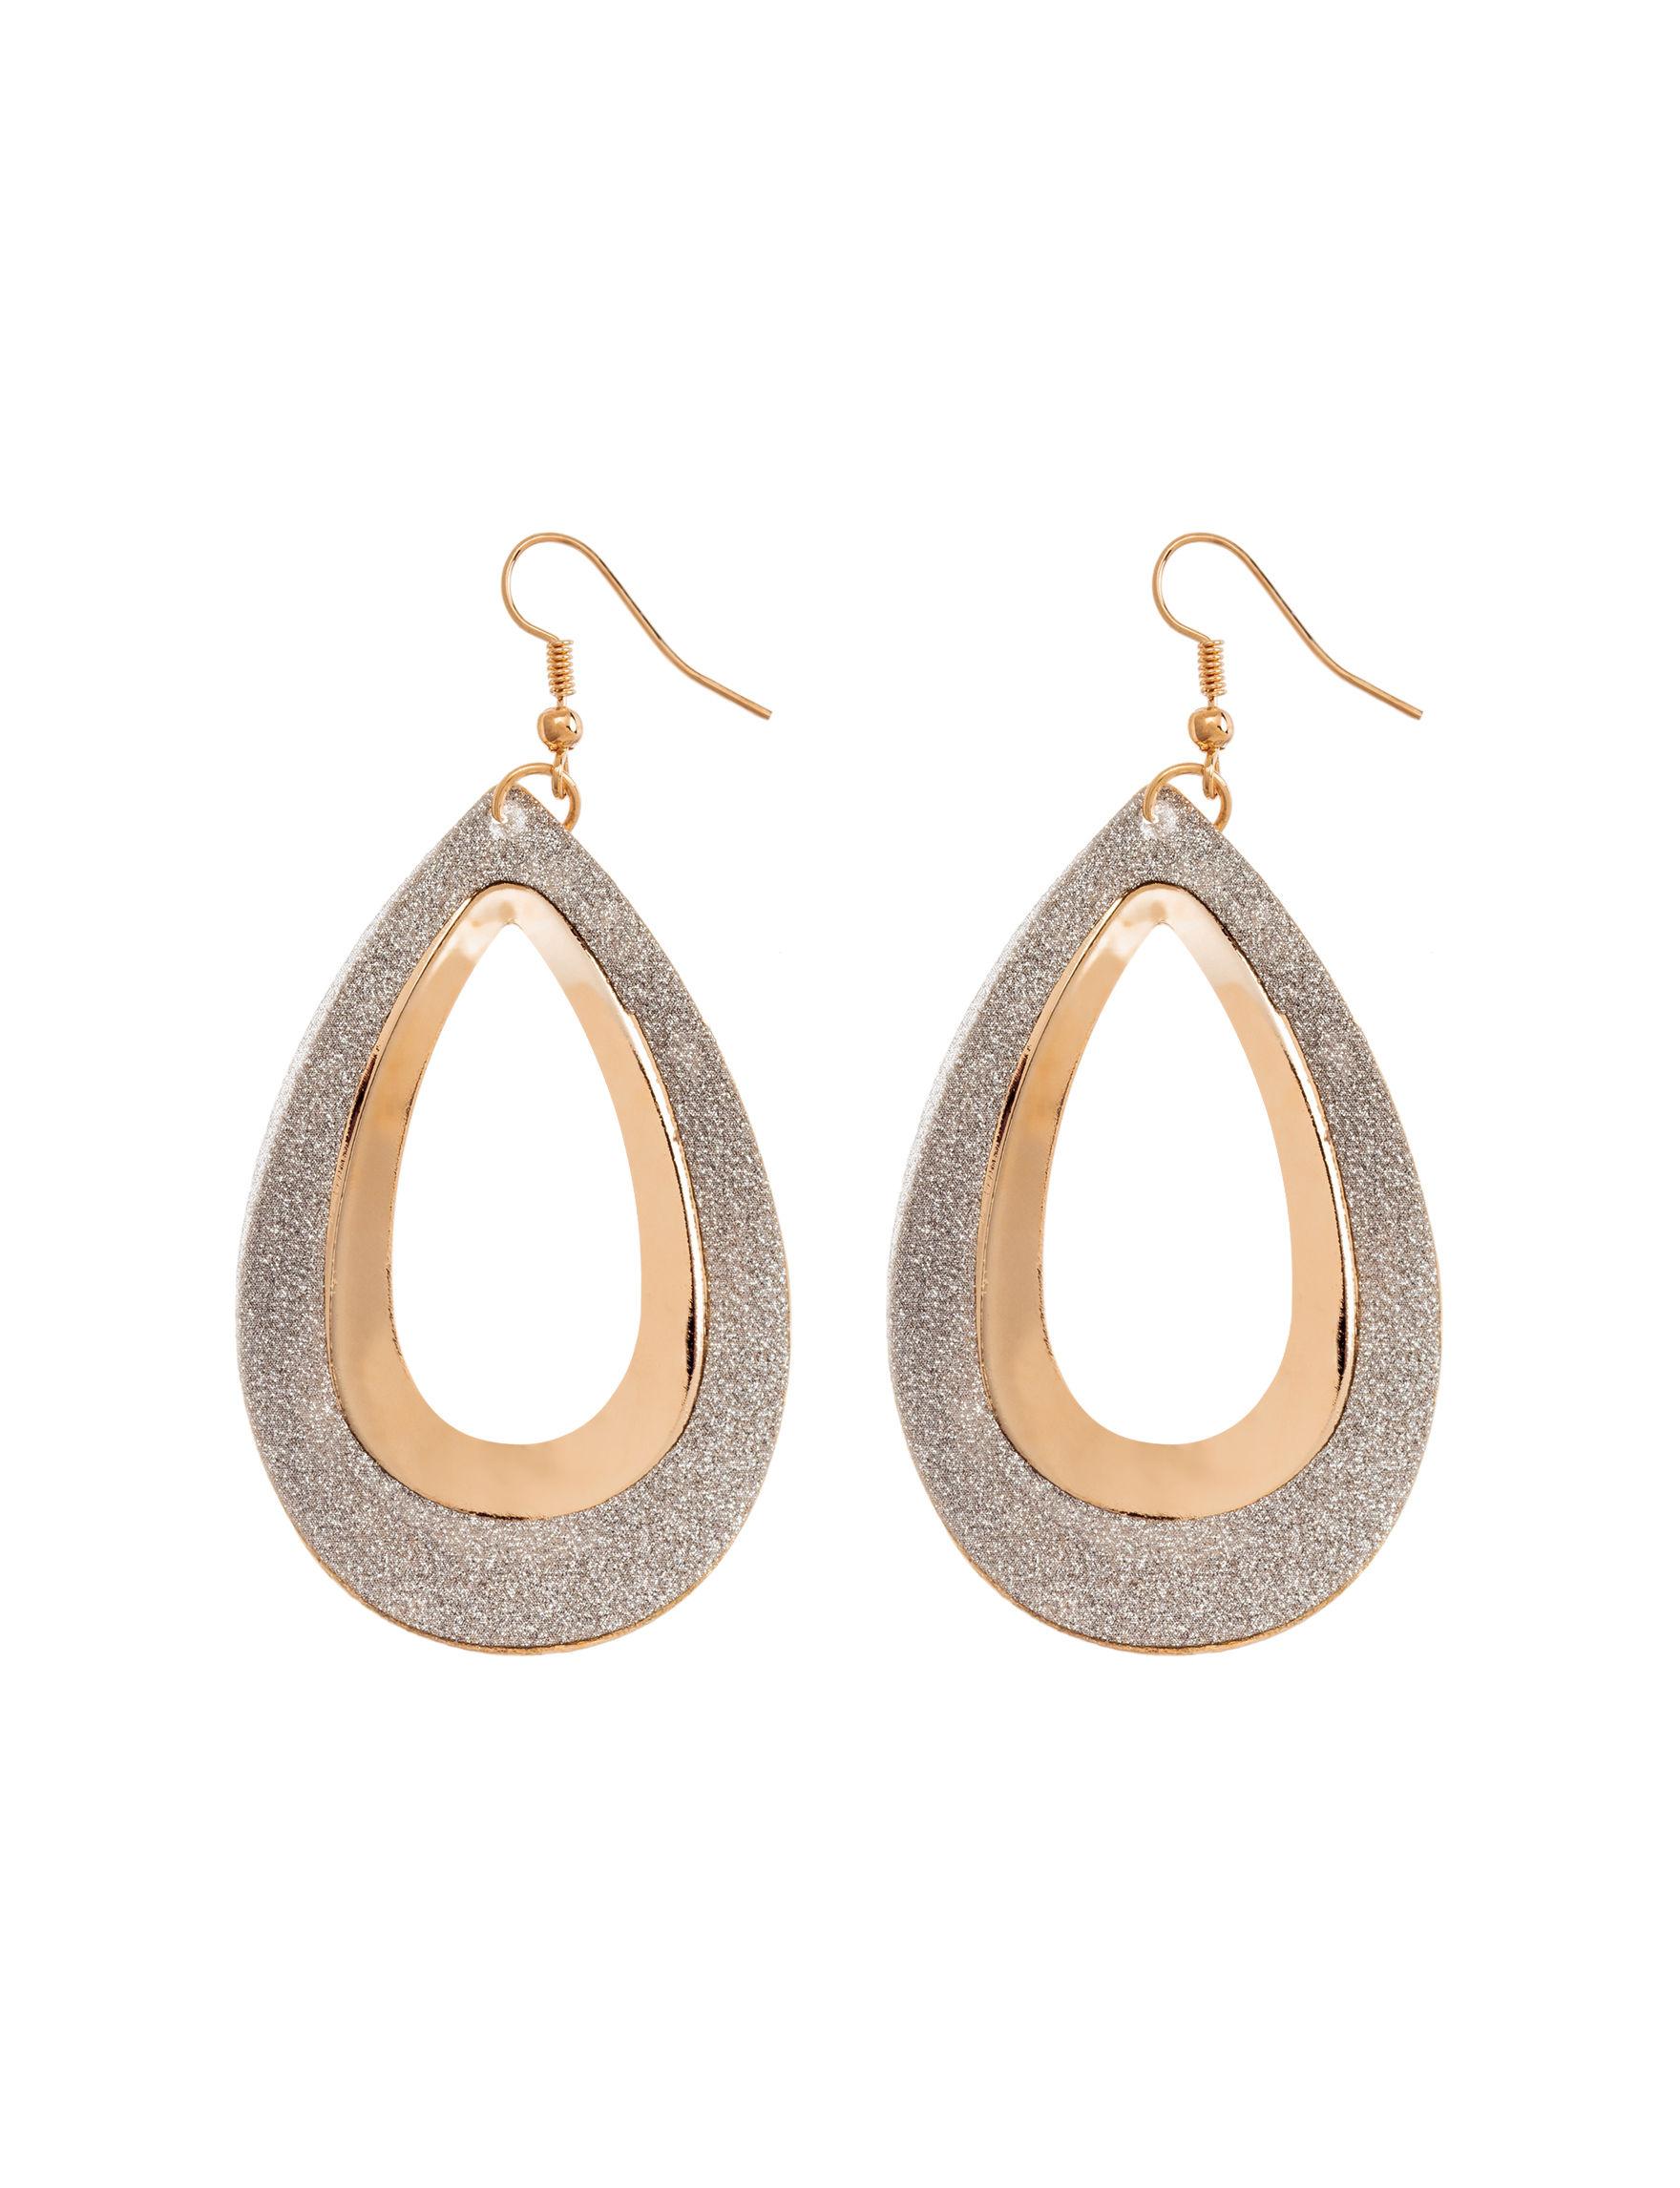 Hannah Gold Drops Earrings Fashion Jewelry